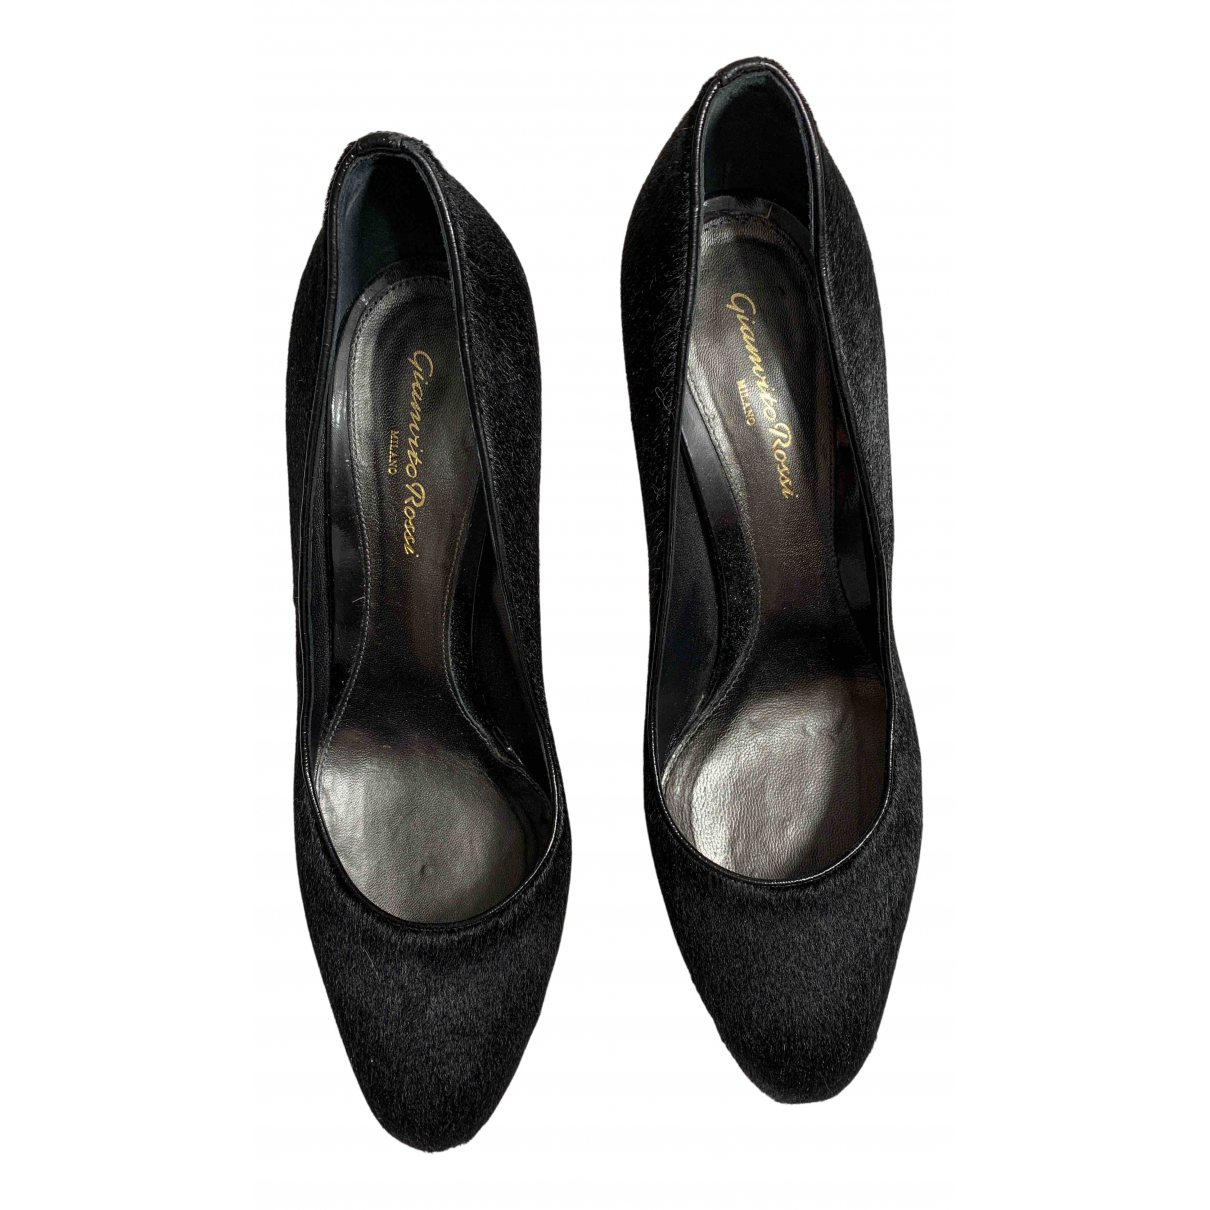 Gianvito Rossi N Black Pony-style calfskin Heels for Women 41.5 IT